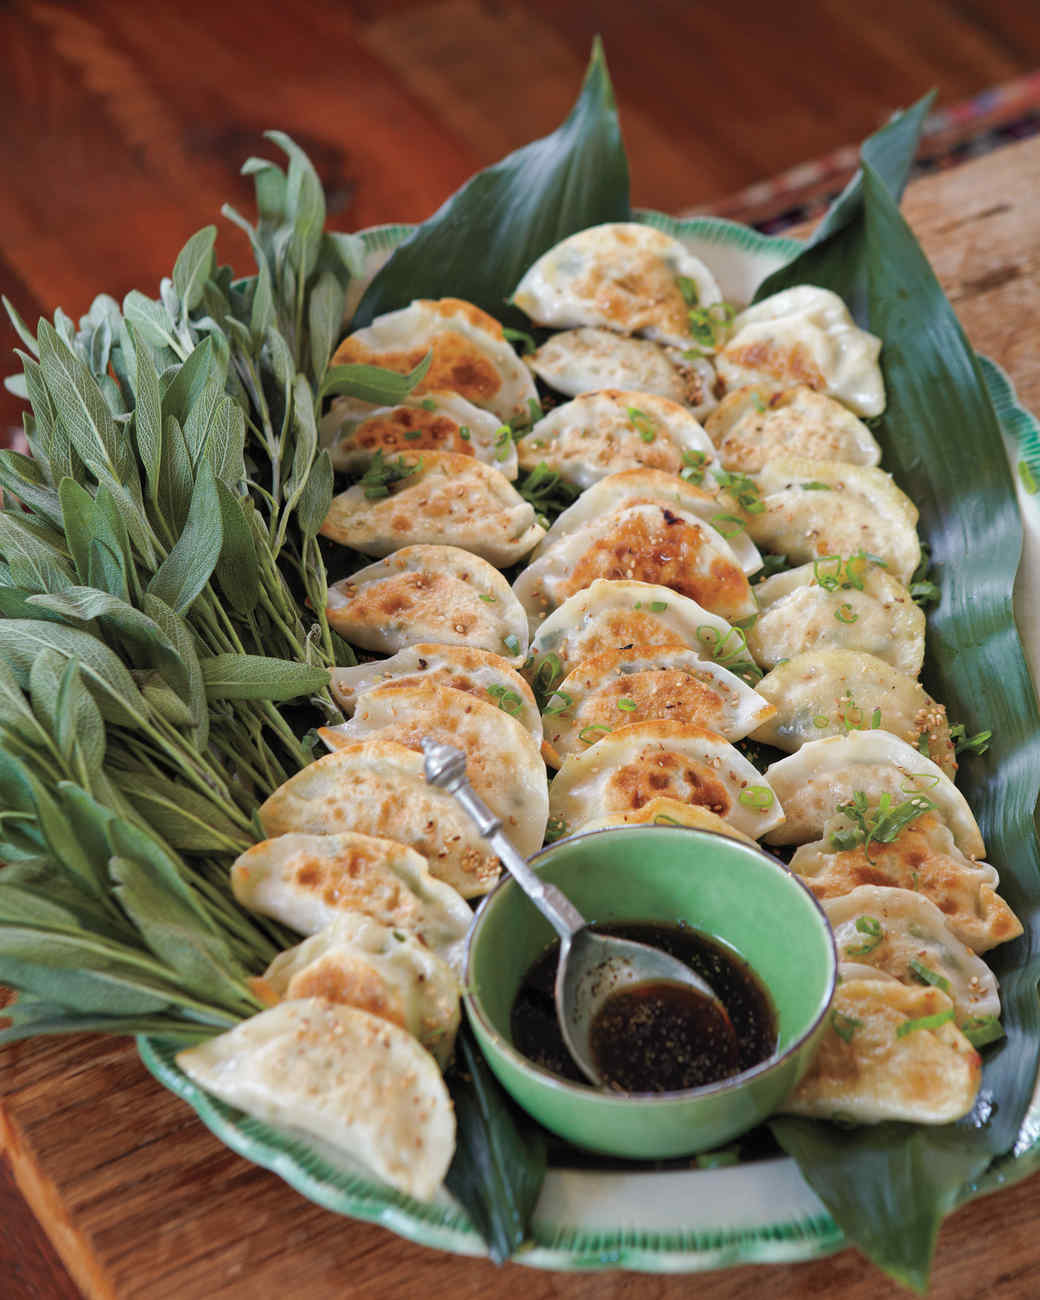 korean-bbq-dumplings-mld108045.jpg